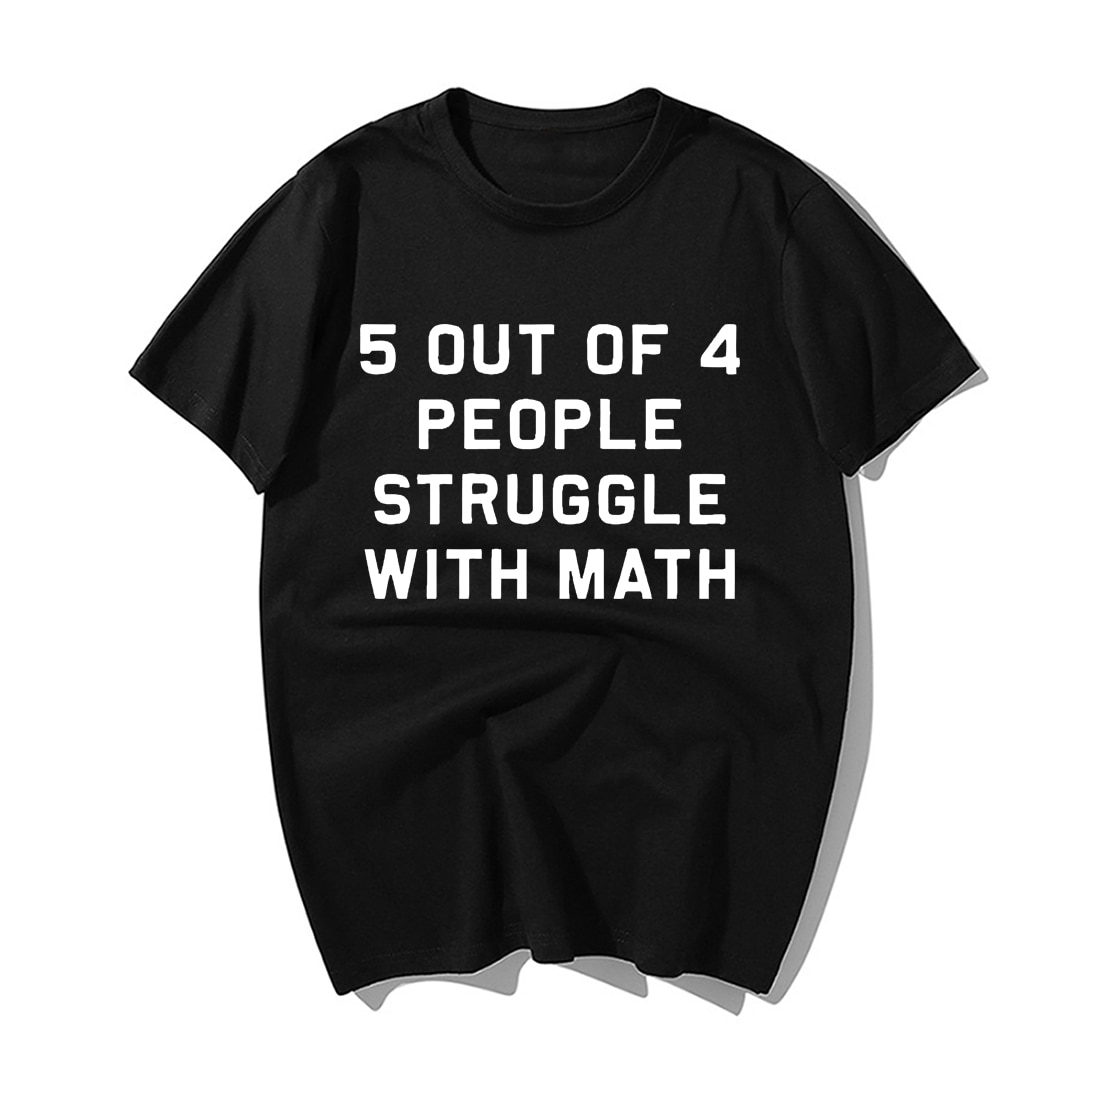 Fashion 5 Of 4 People Struggle With Math T Shirt Funny School Teacher Teaching Humor T-Shirt Men Casual Cotton Tshirts Tops Tees